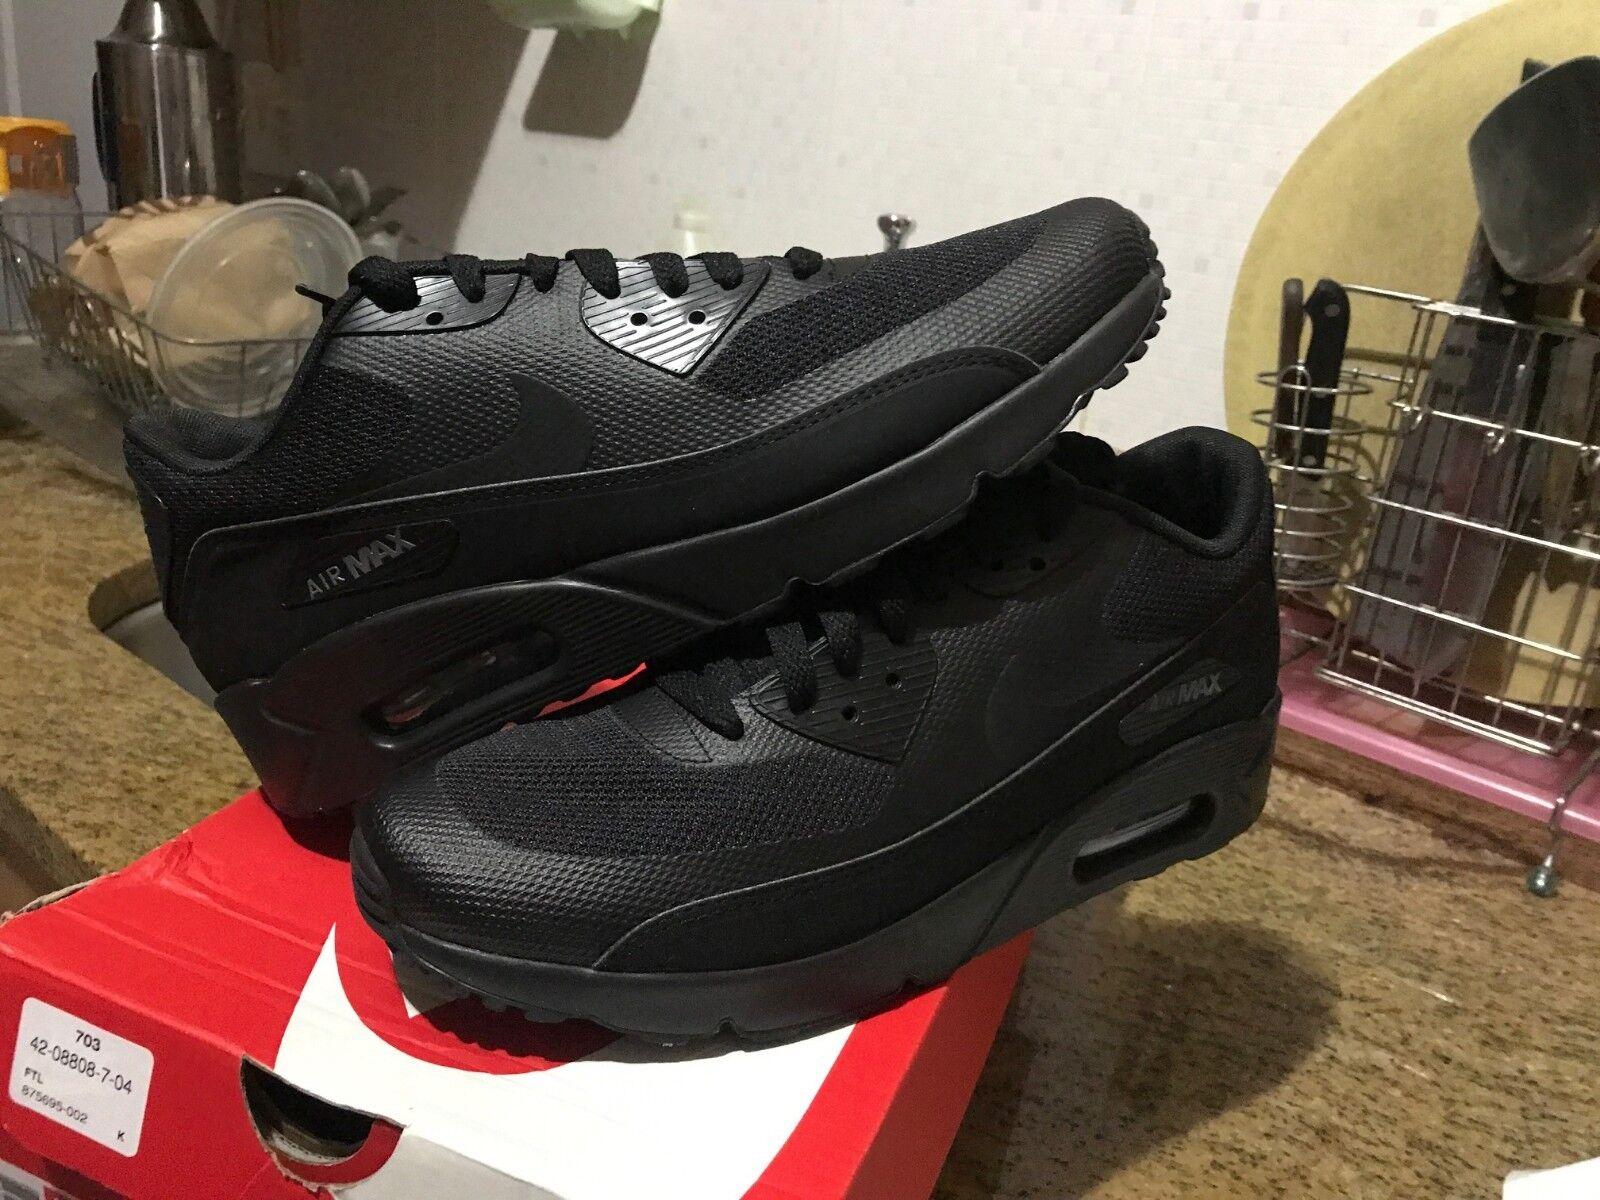 Nike Dark Air Max 90 Ultra 2.0 Essential Black Noir Dark Nike Grey 875695 002 Men 319c7a